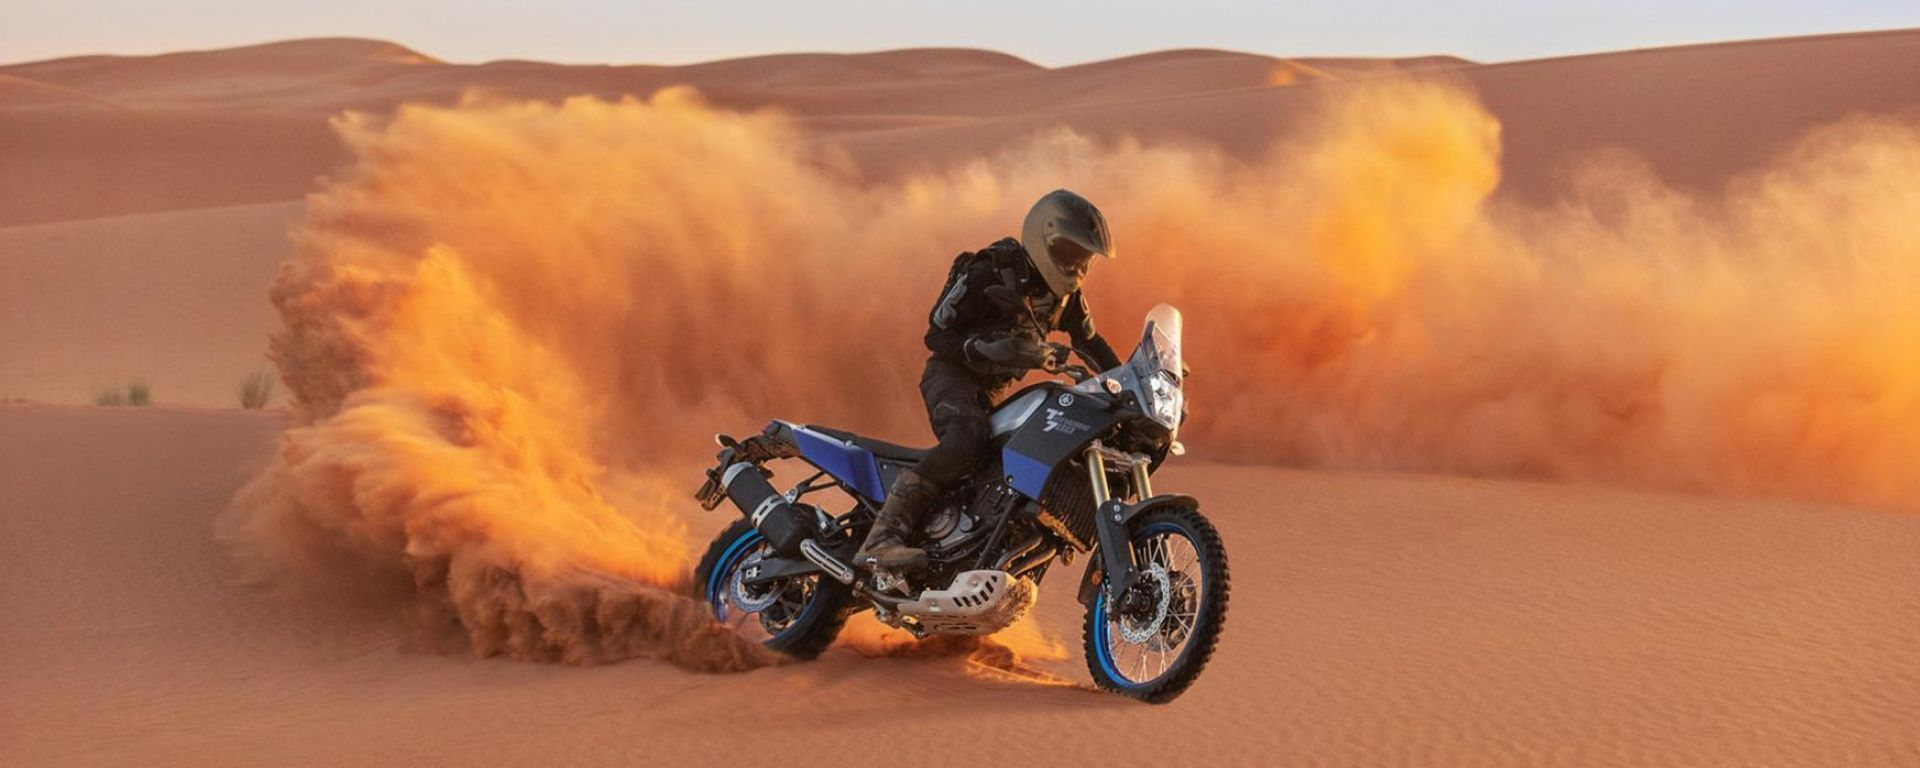 Yamaha Ténéré 700: se la prenoti online arriva prima e costa meno